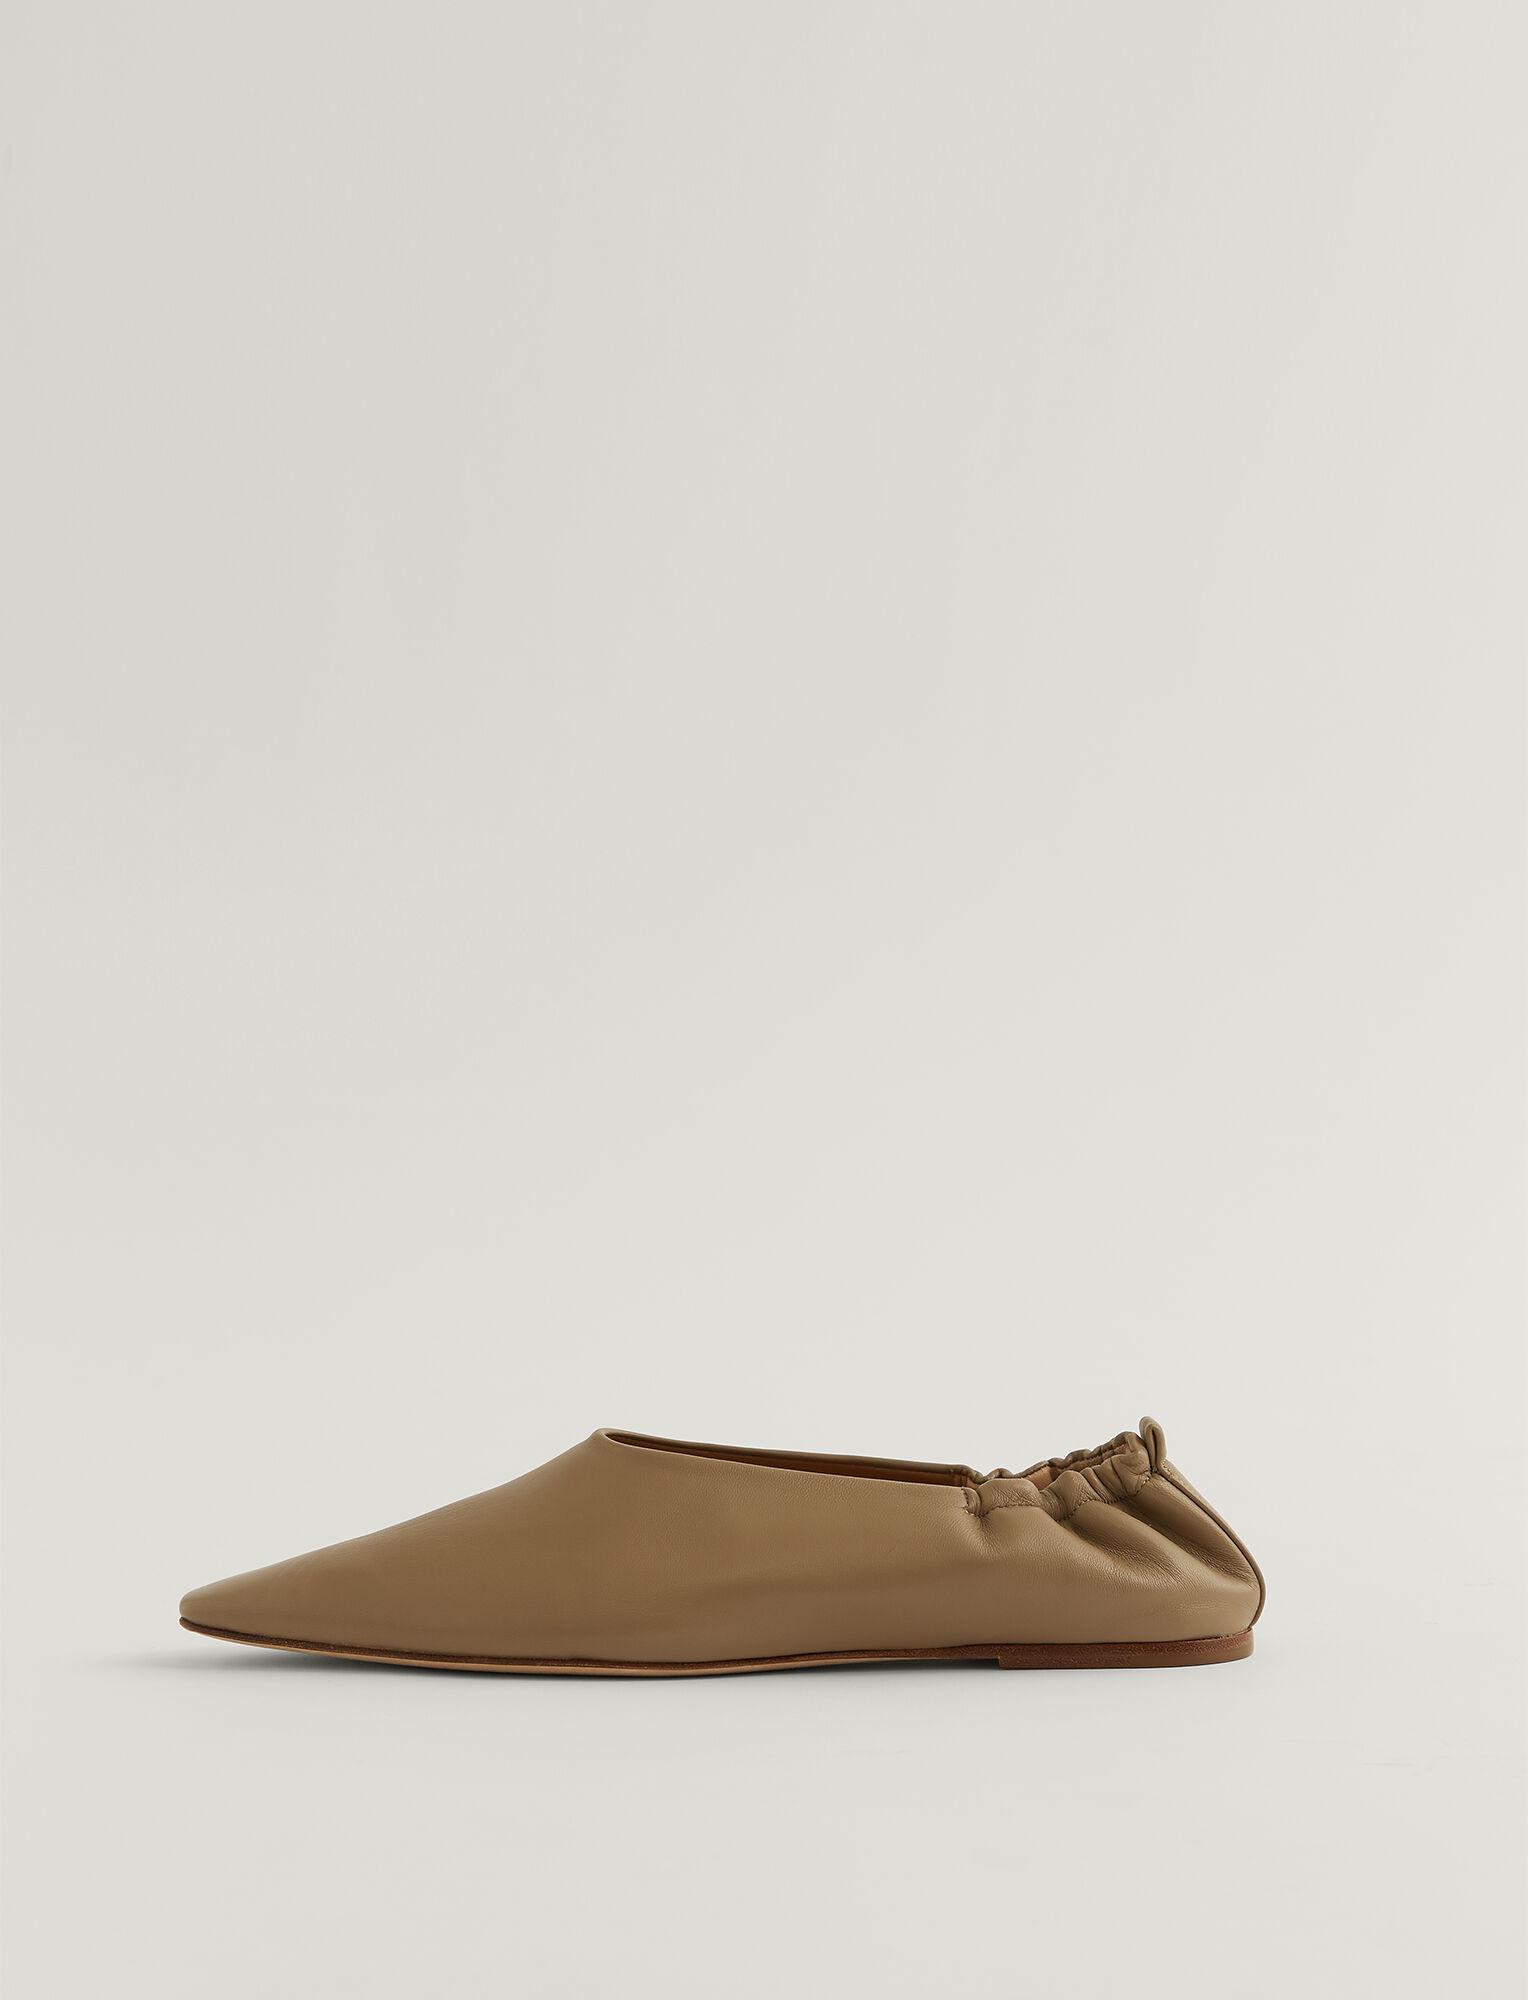 Joseph, Pointy Square Ballerina Shoes, in MASTIC